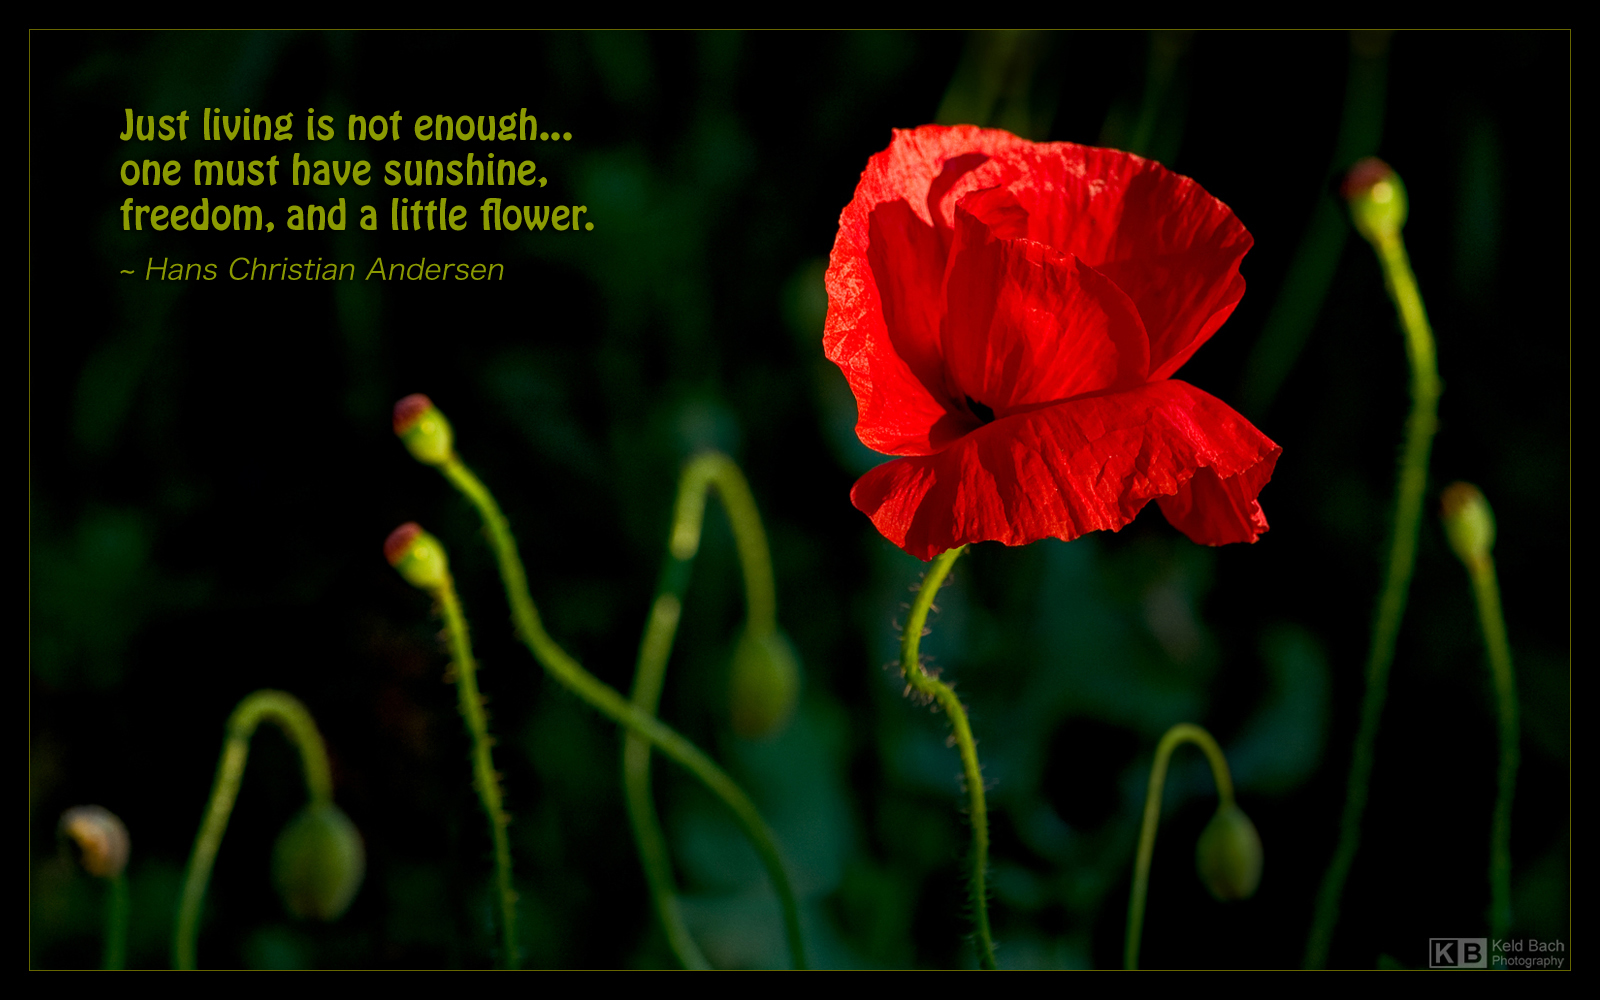 Just Living is Not Enough... by KeldBach